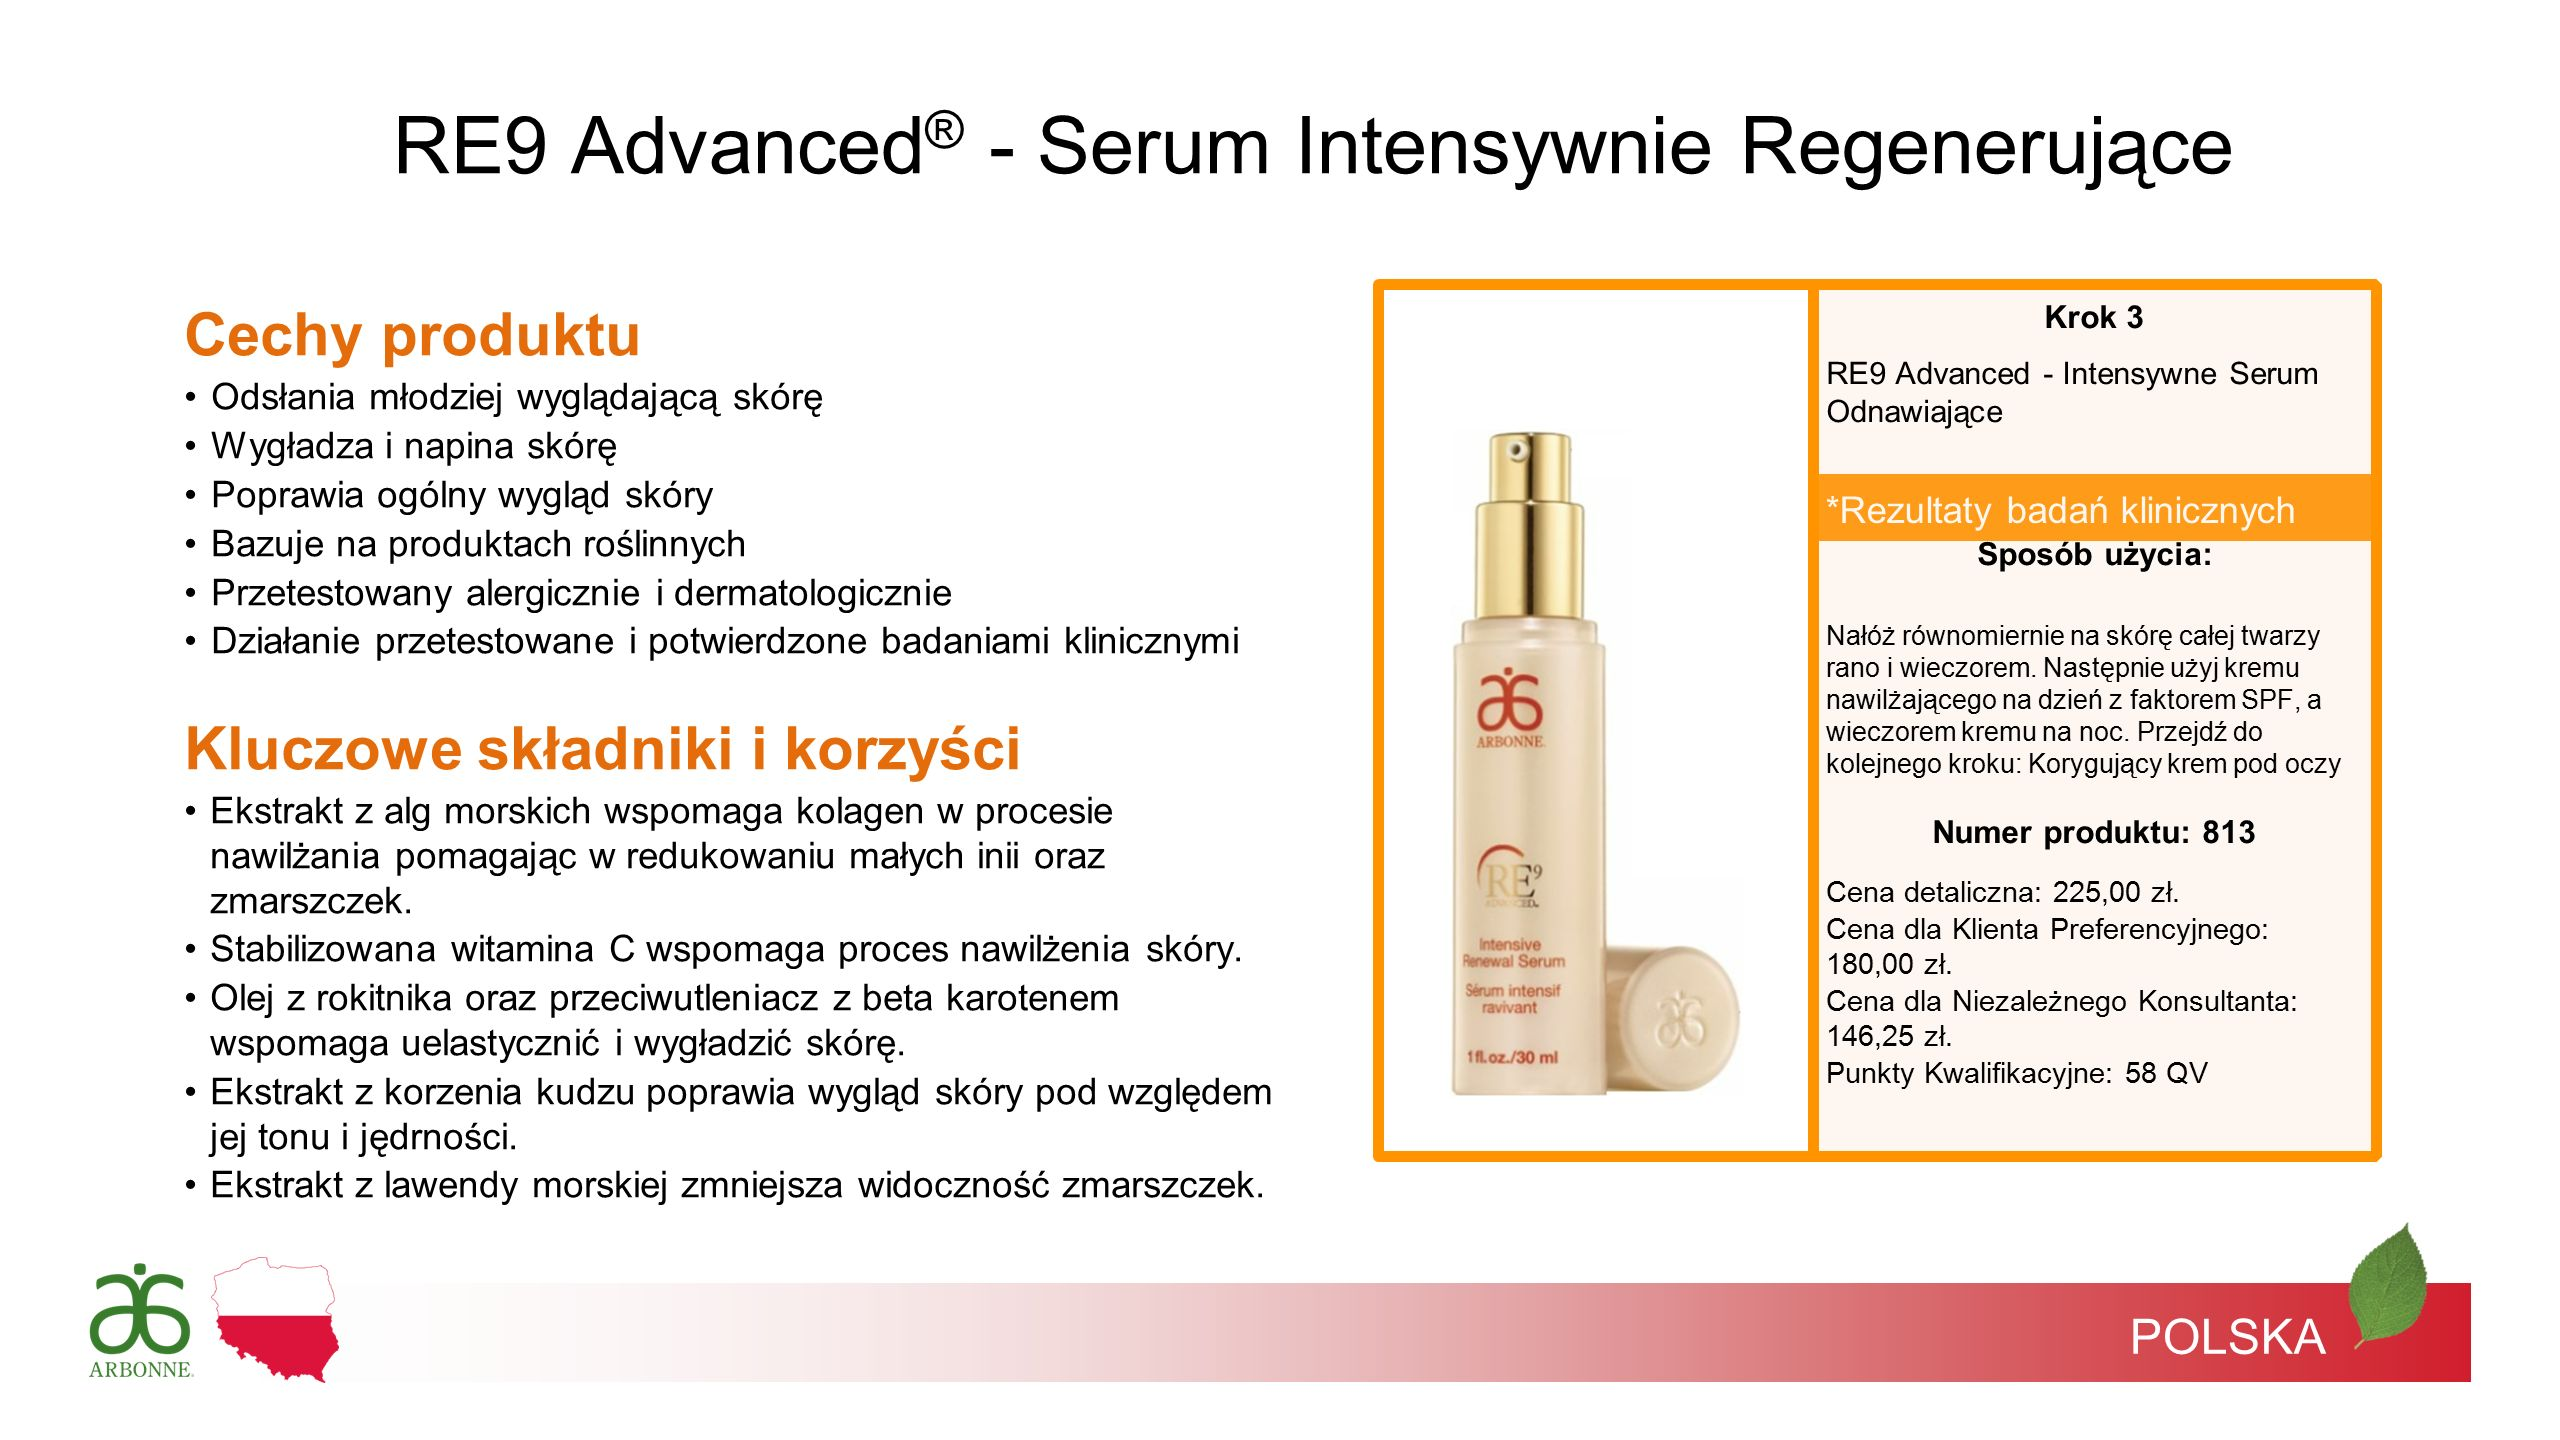 RE9 Advanced® - Serum Intensywnie Regenerujące